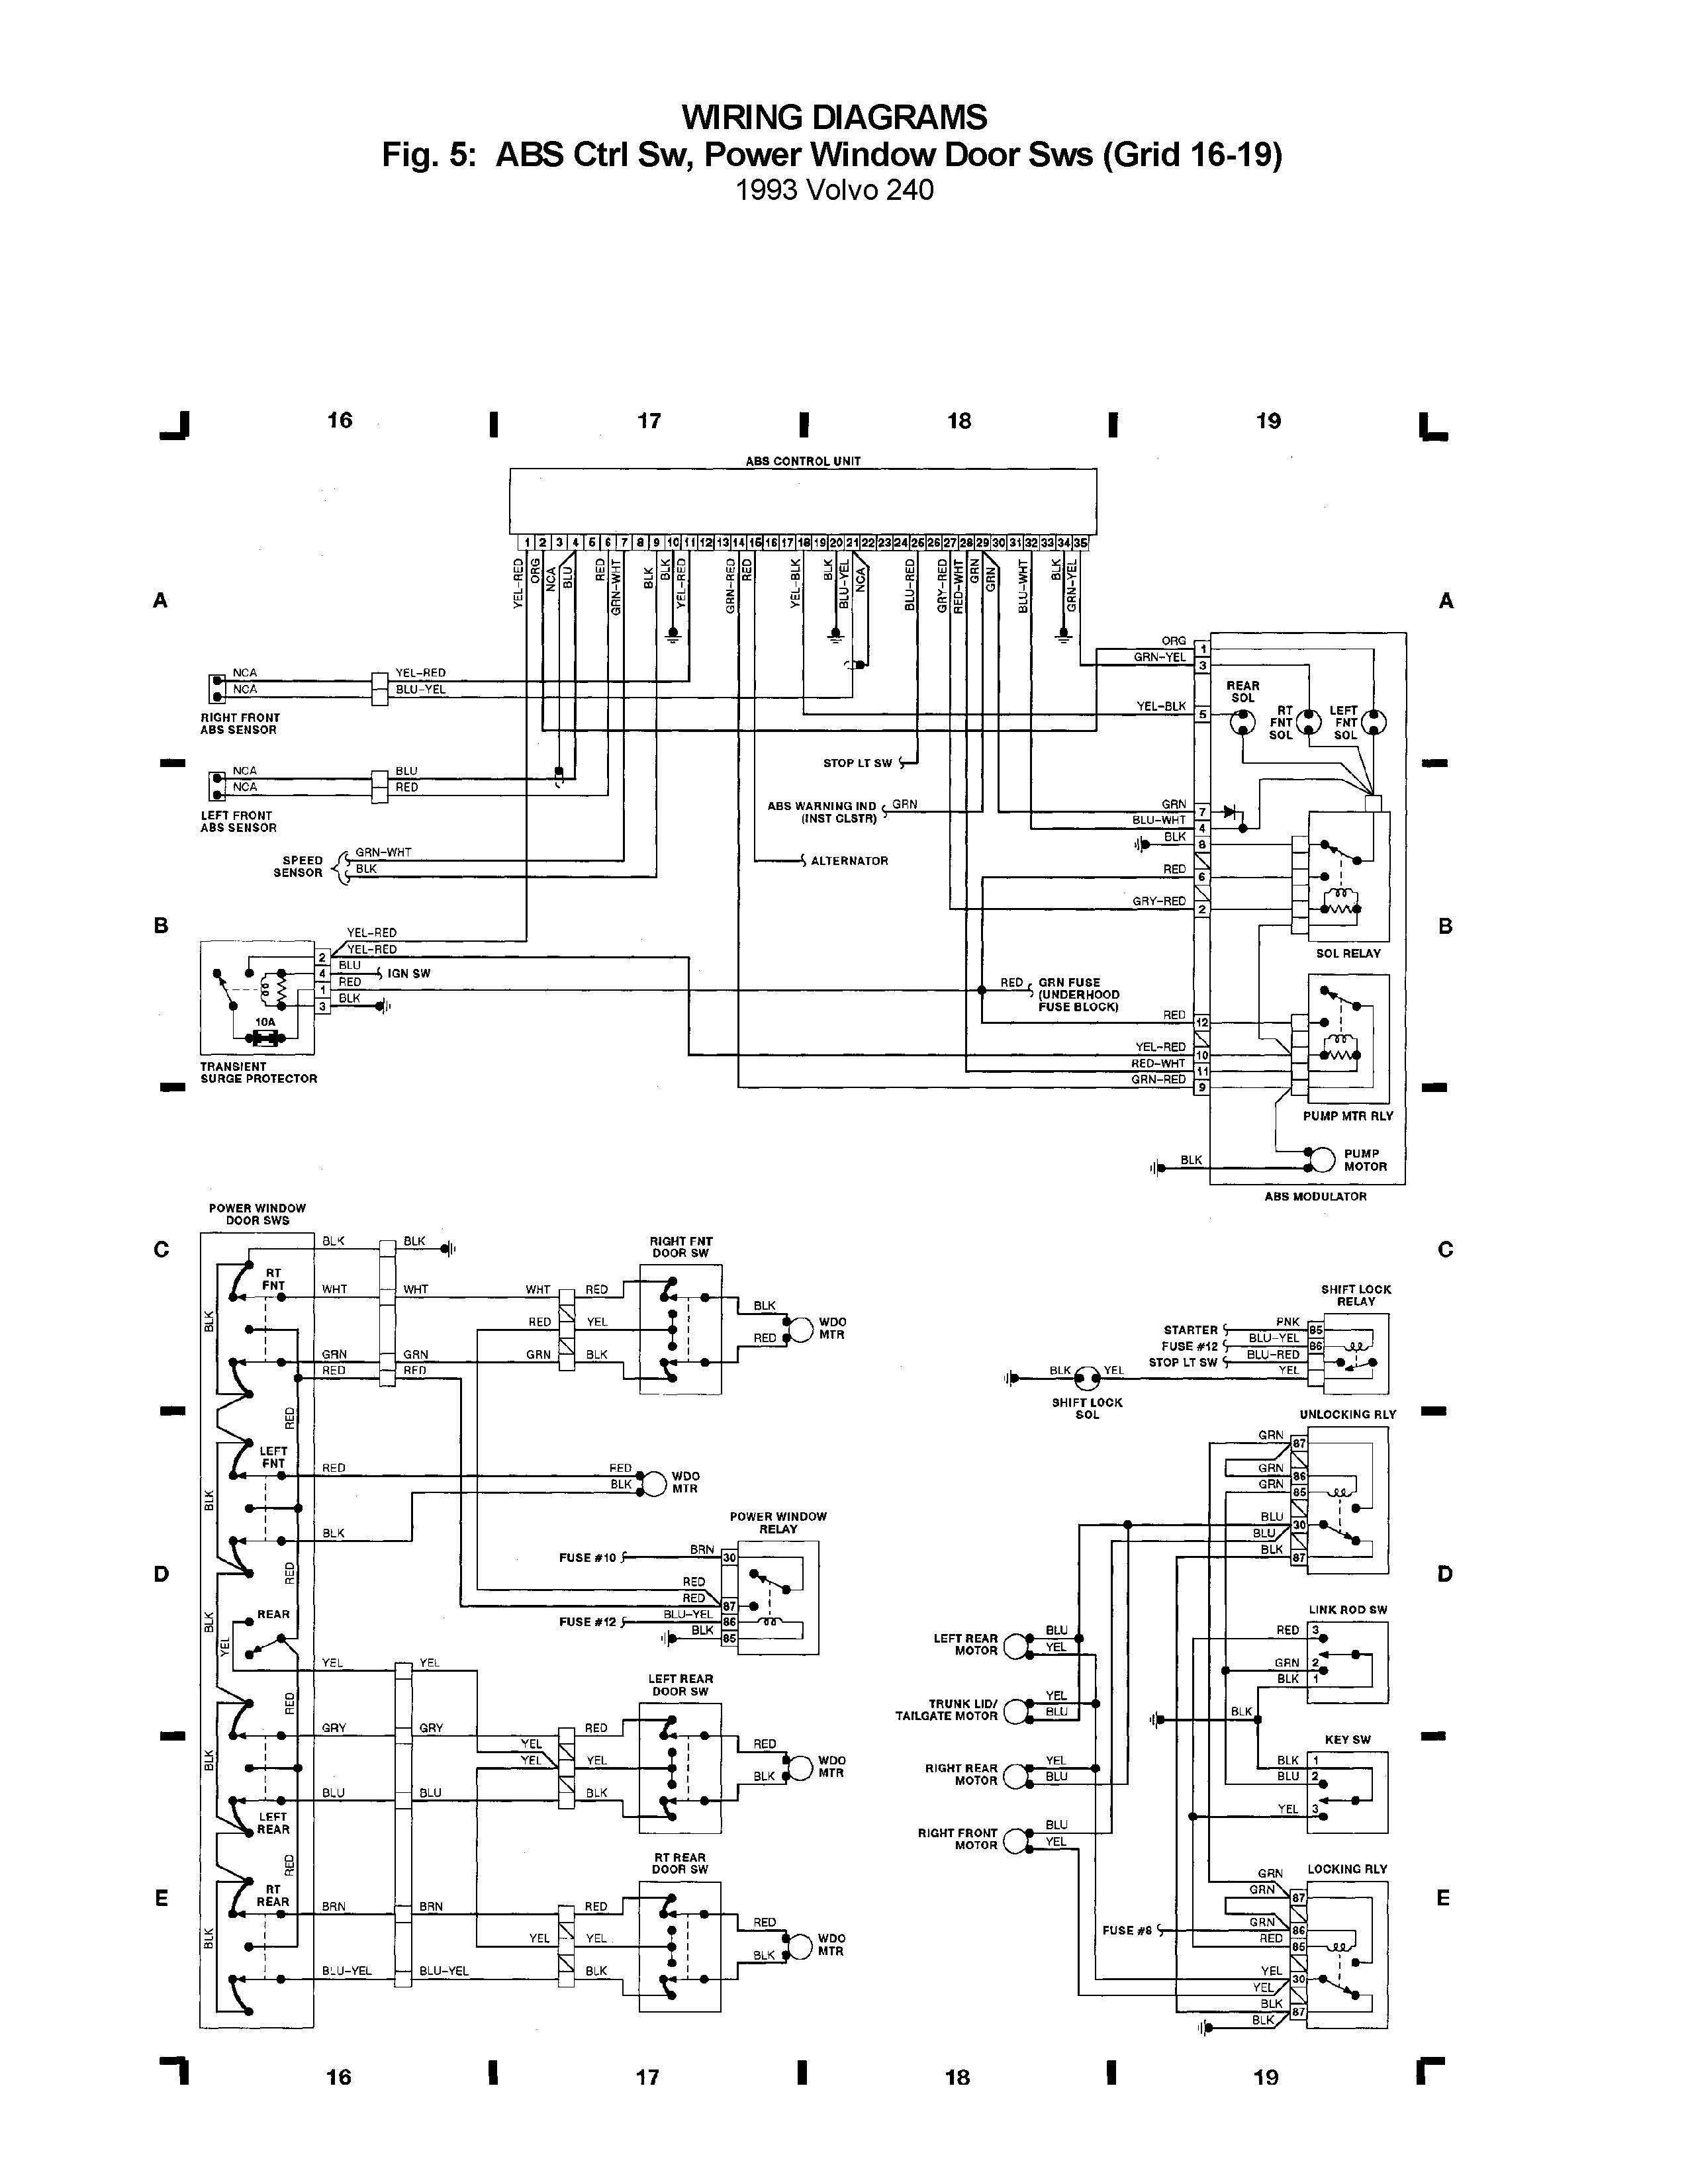 1993 volvo 240 wiring diagrams freightliner m2 diagram library abs crtl sw power window door rh carknowledge info